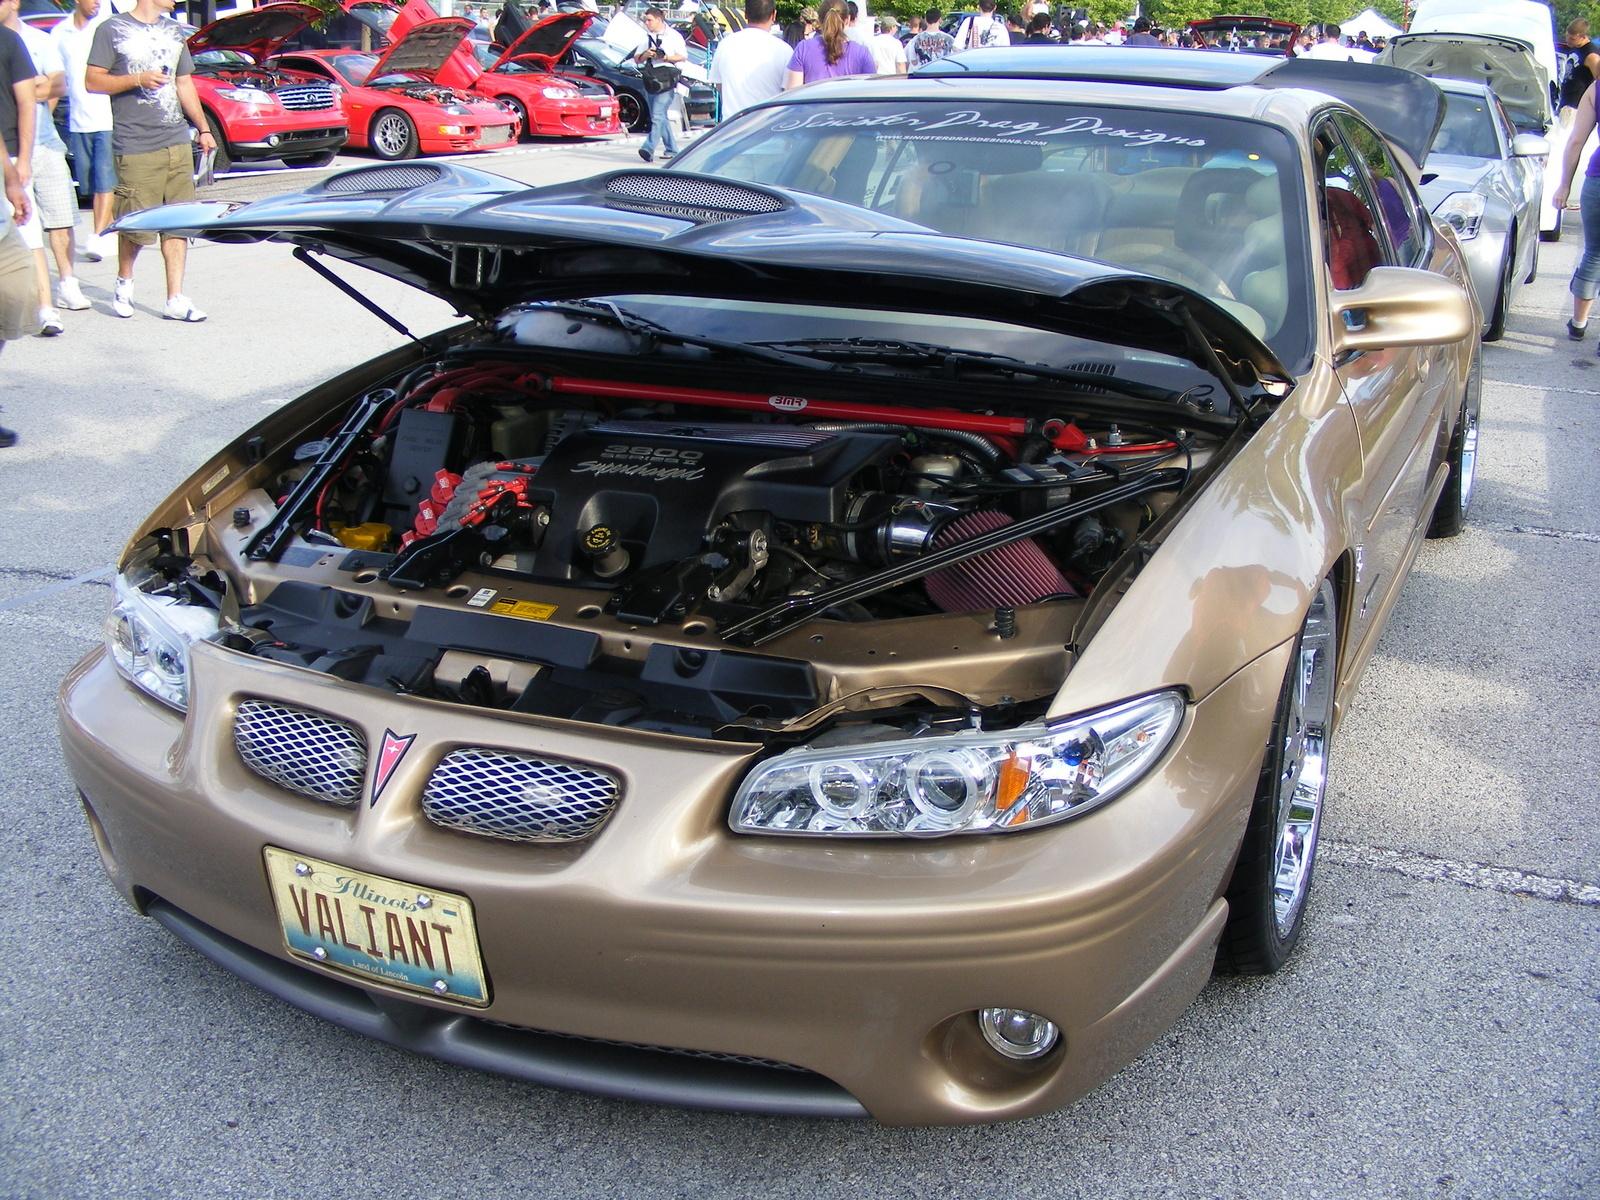 2004 Pontiac Grand Am Fuse Box Diagram Have A Pontiac Grand Prix Questions I Have A 2002 Pontiac Gran